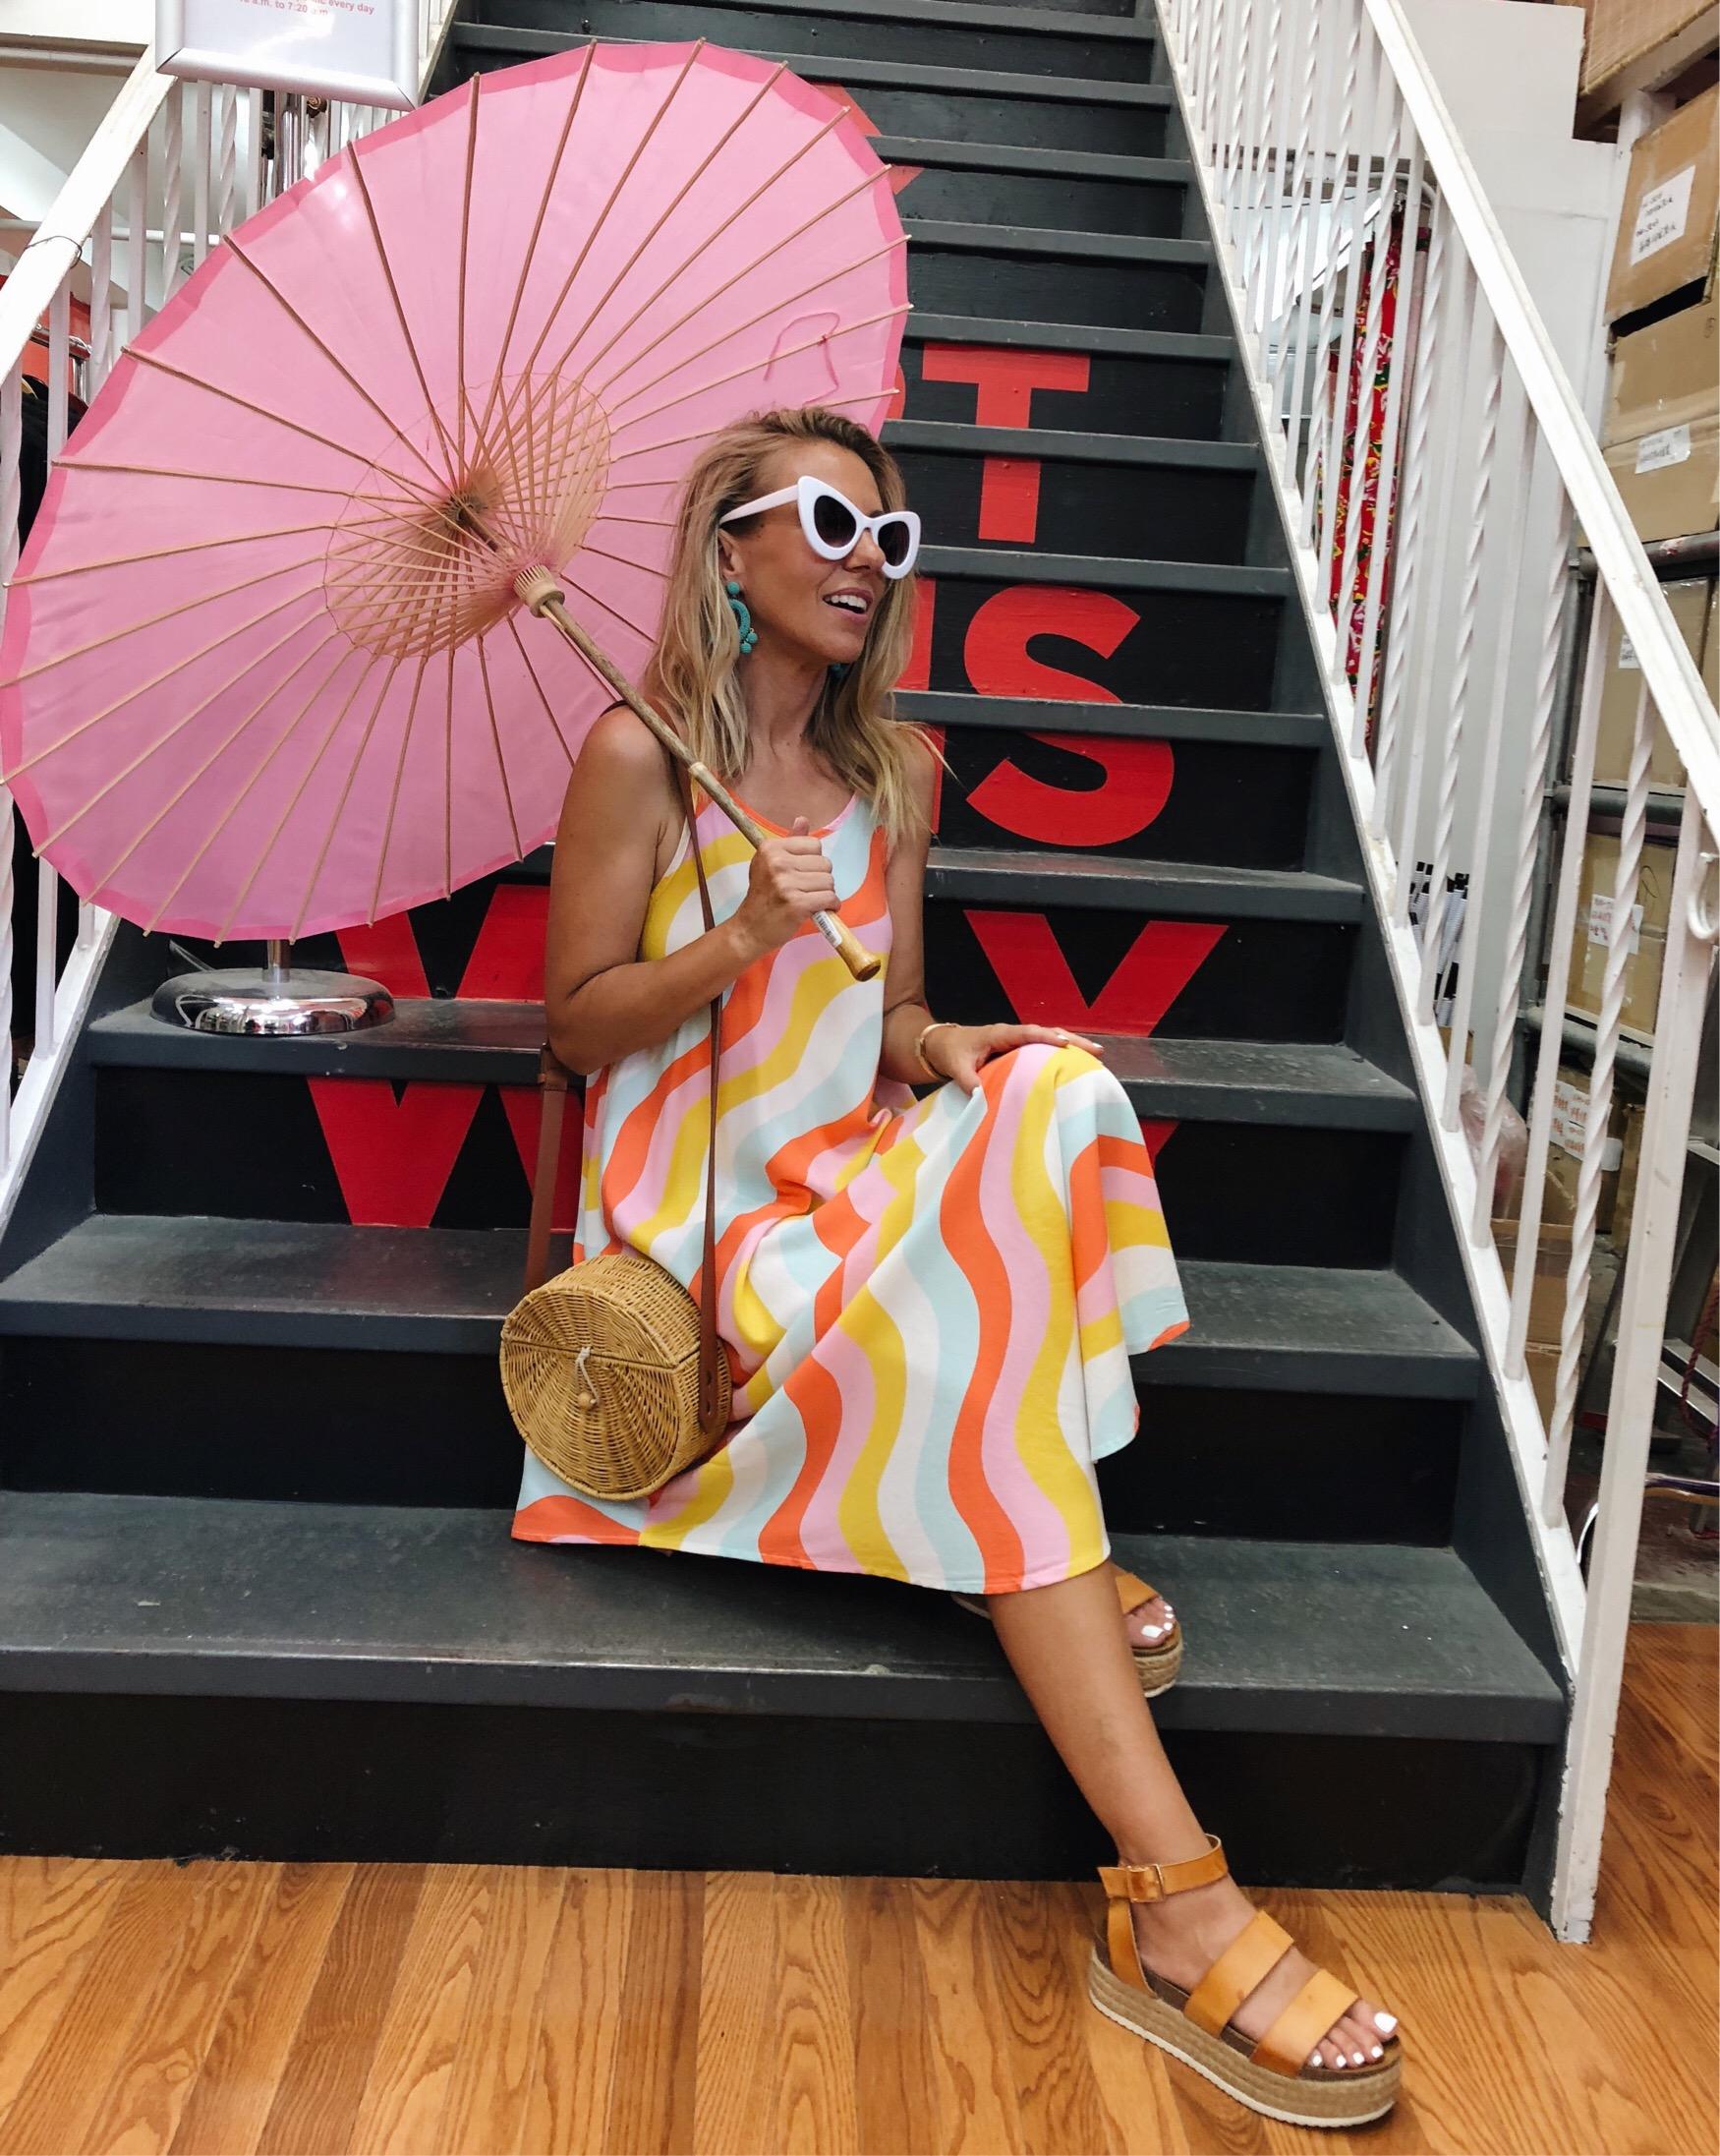 ADVENTURES IN NEW YORK- Jaclyn De Leon Style + retro style maxi dress + target style + straw crossbody handbag + platform sandals + white retro sunglasses + striped dress + casual summer style + NY street style